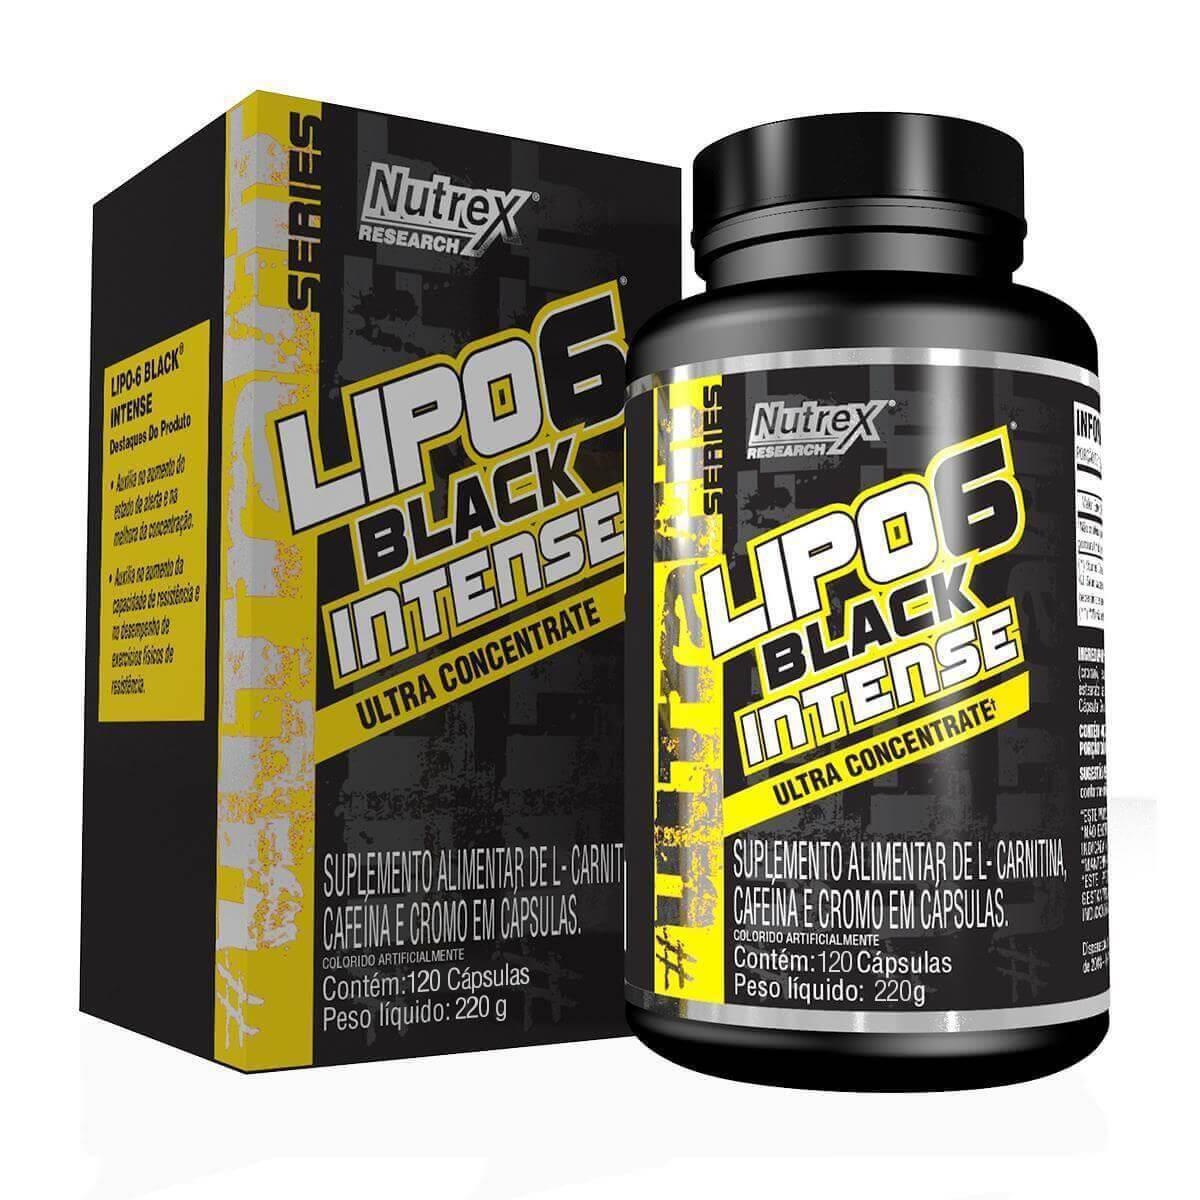 LIPO 6 BLACK INTENSE ULTRA CONCENTRADO 120 CAPS - NUTREX